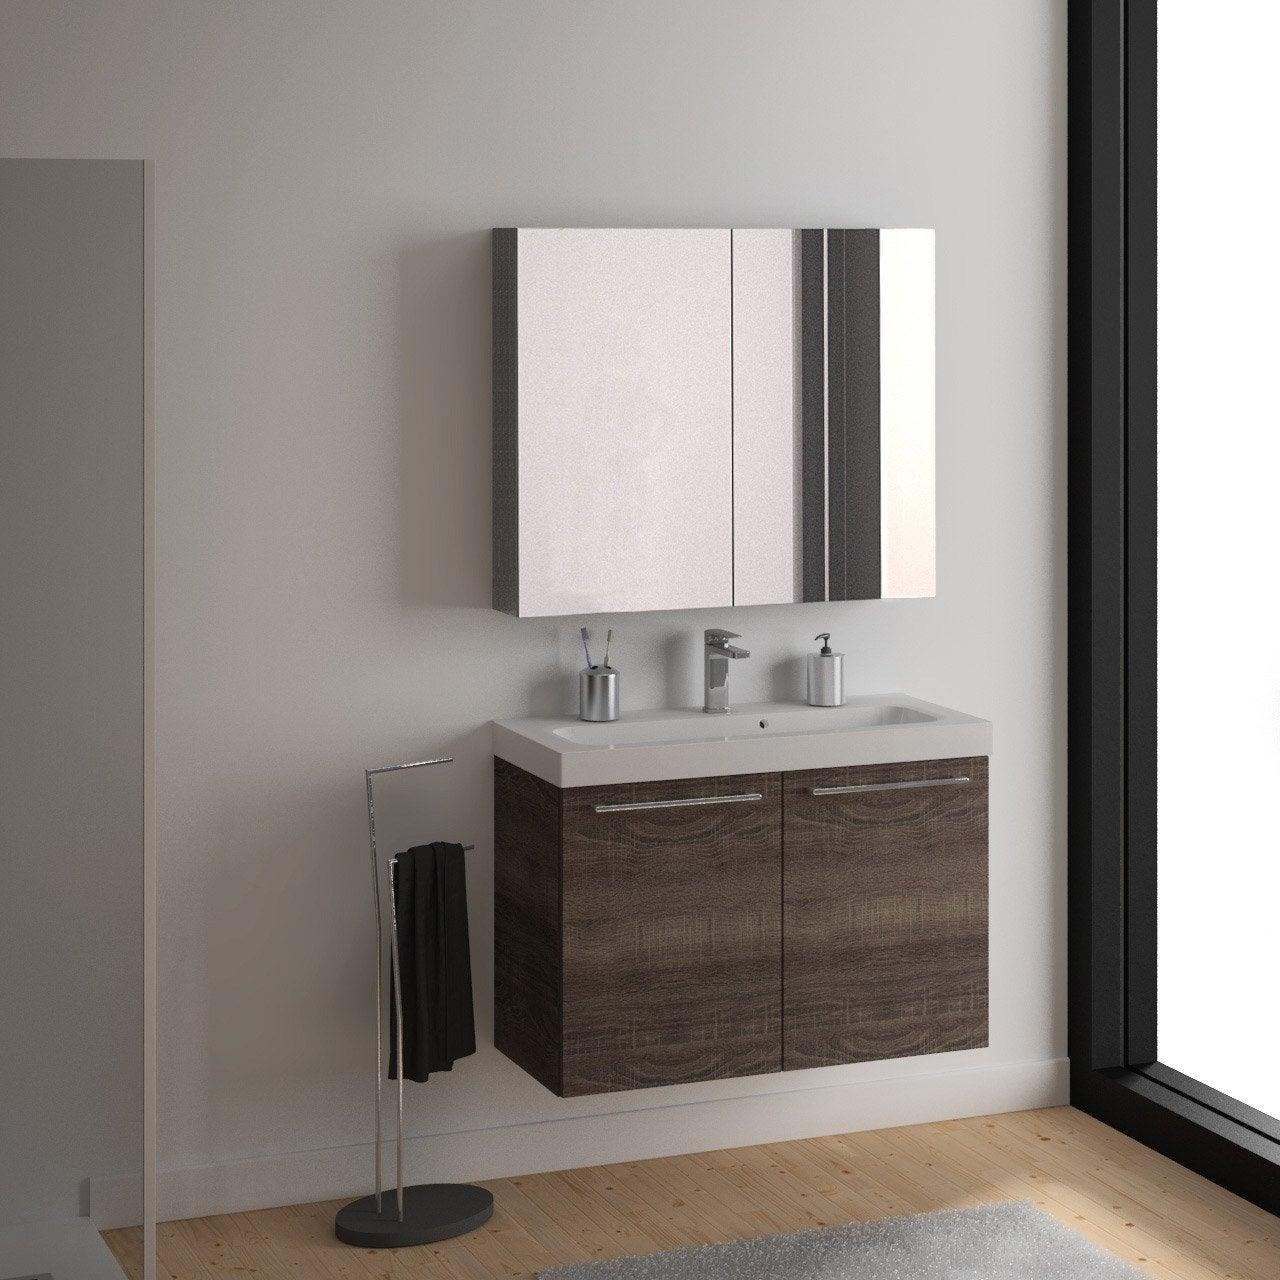 Meuble de salle de bains de 80 99 brun marron remix - Salle de bain remix leroy merlin ...